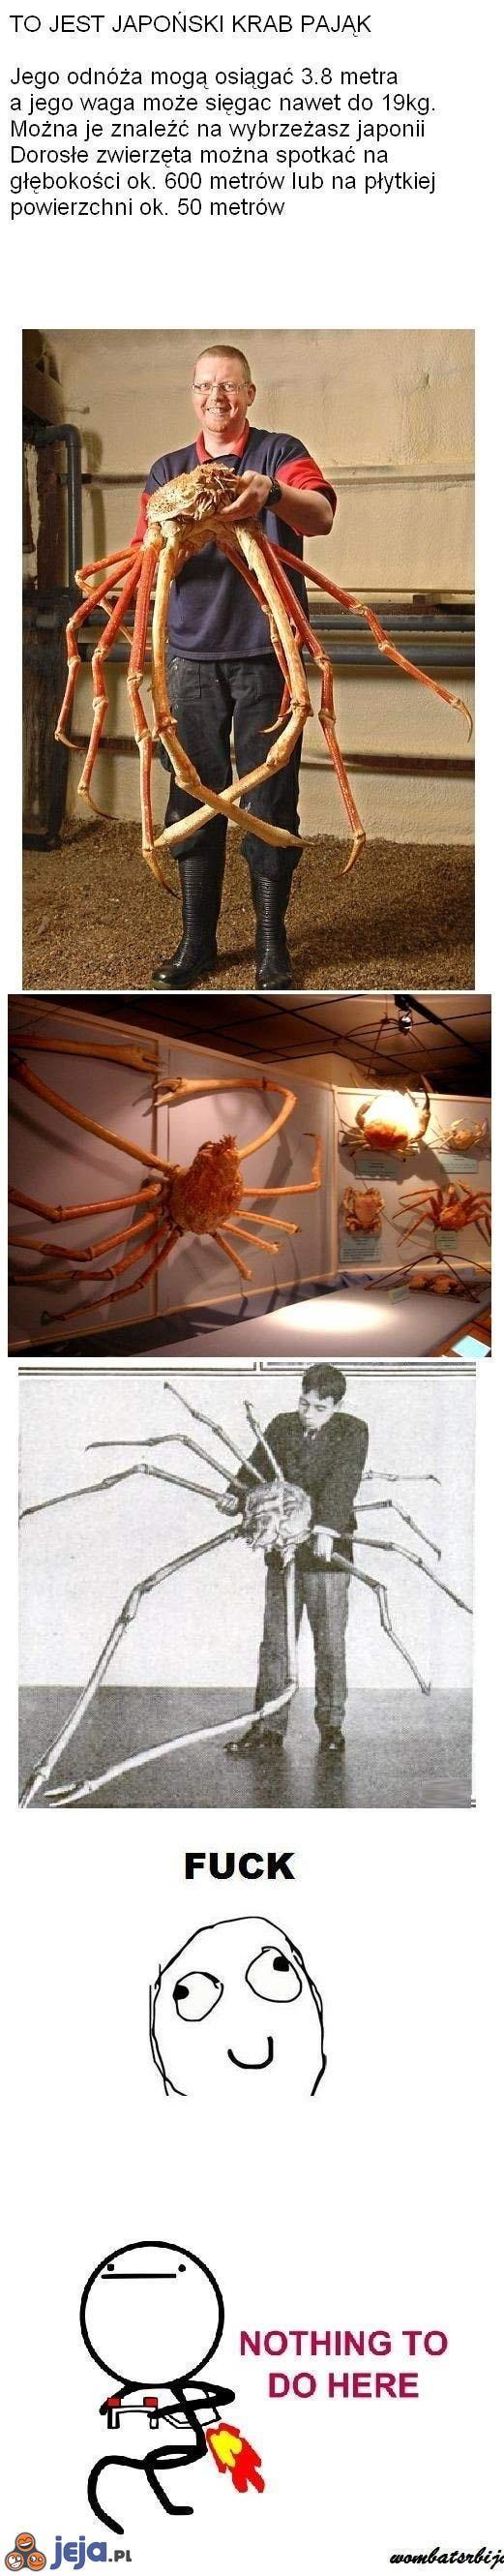 Krab pająk